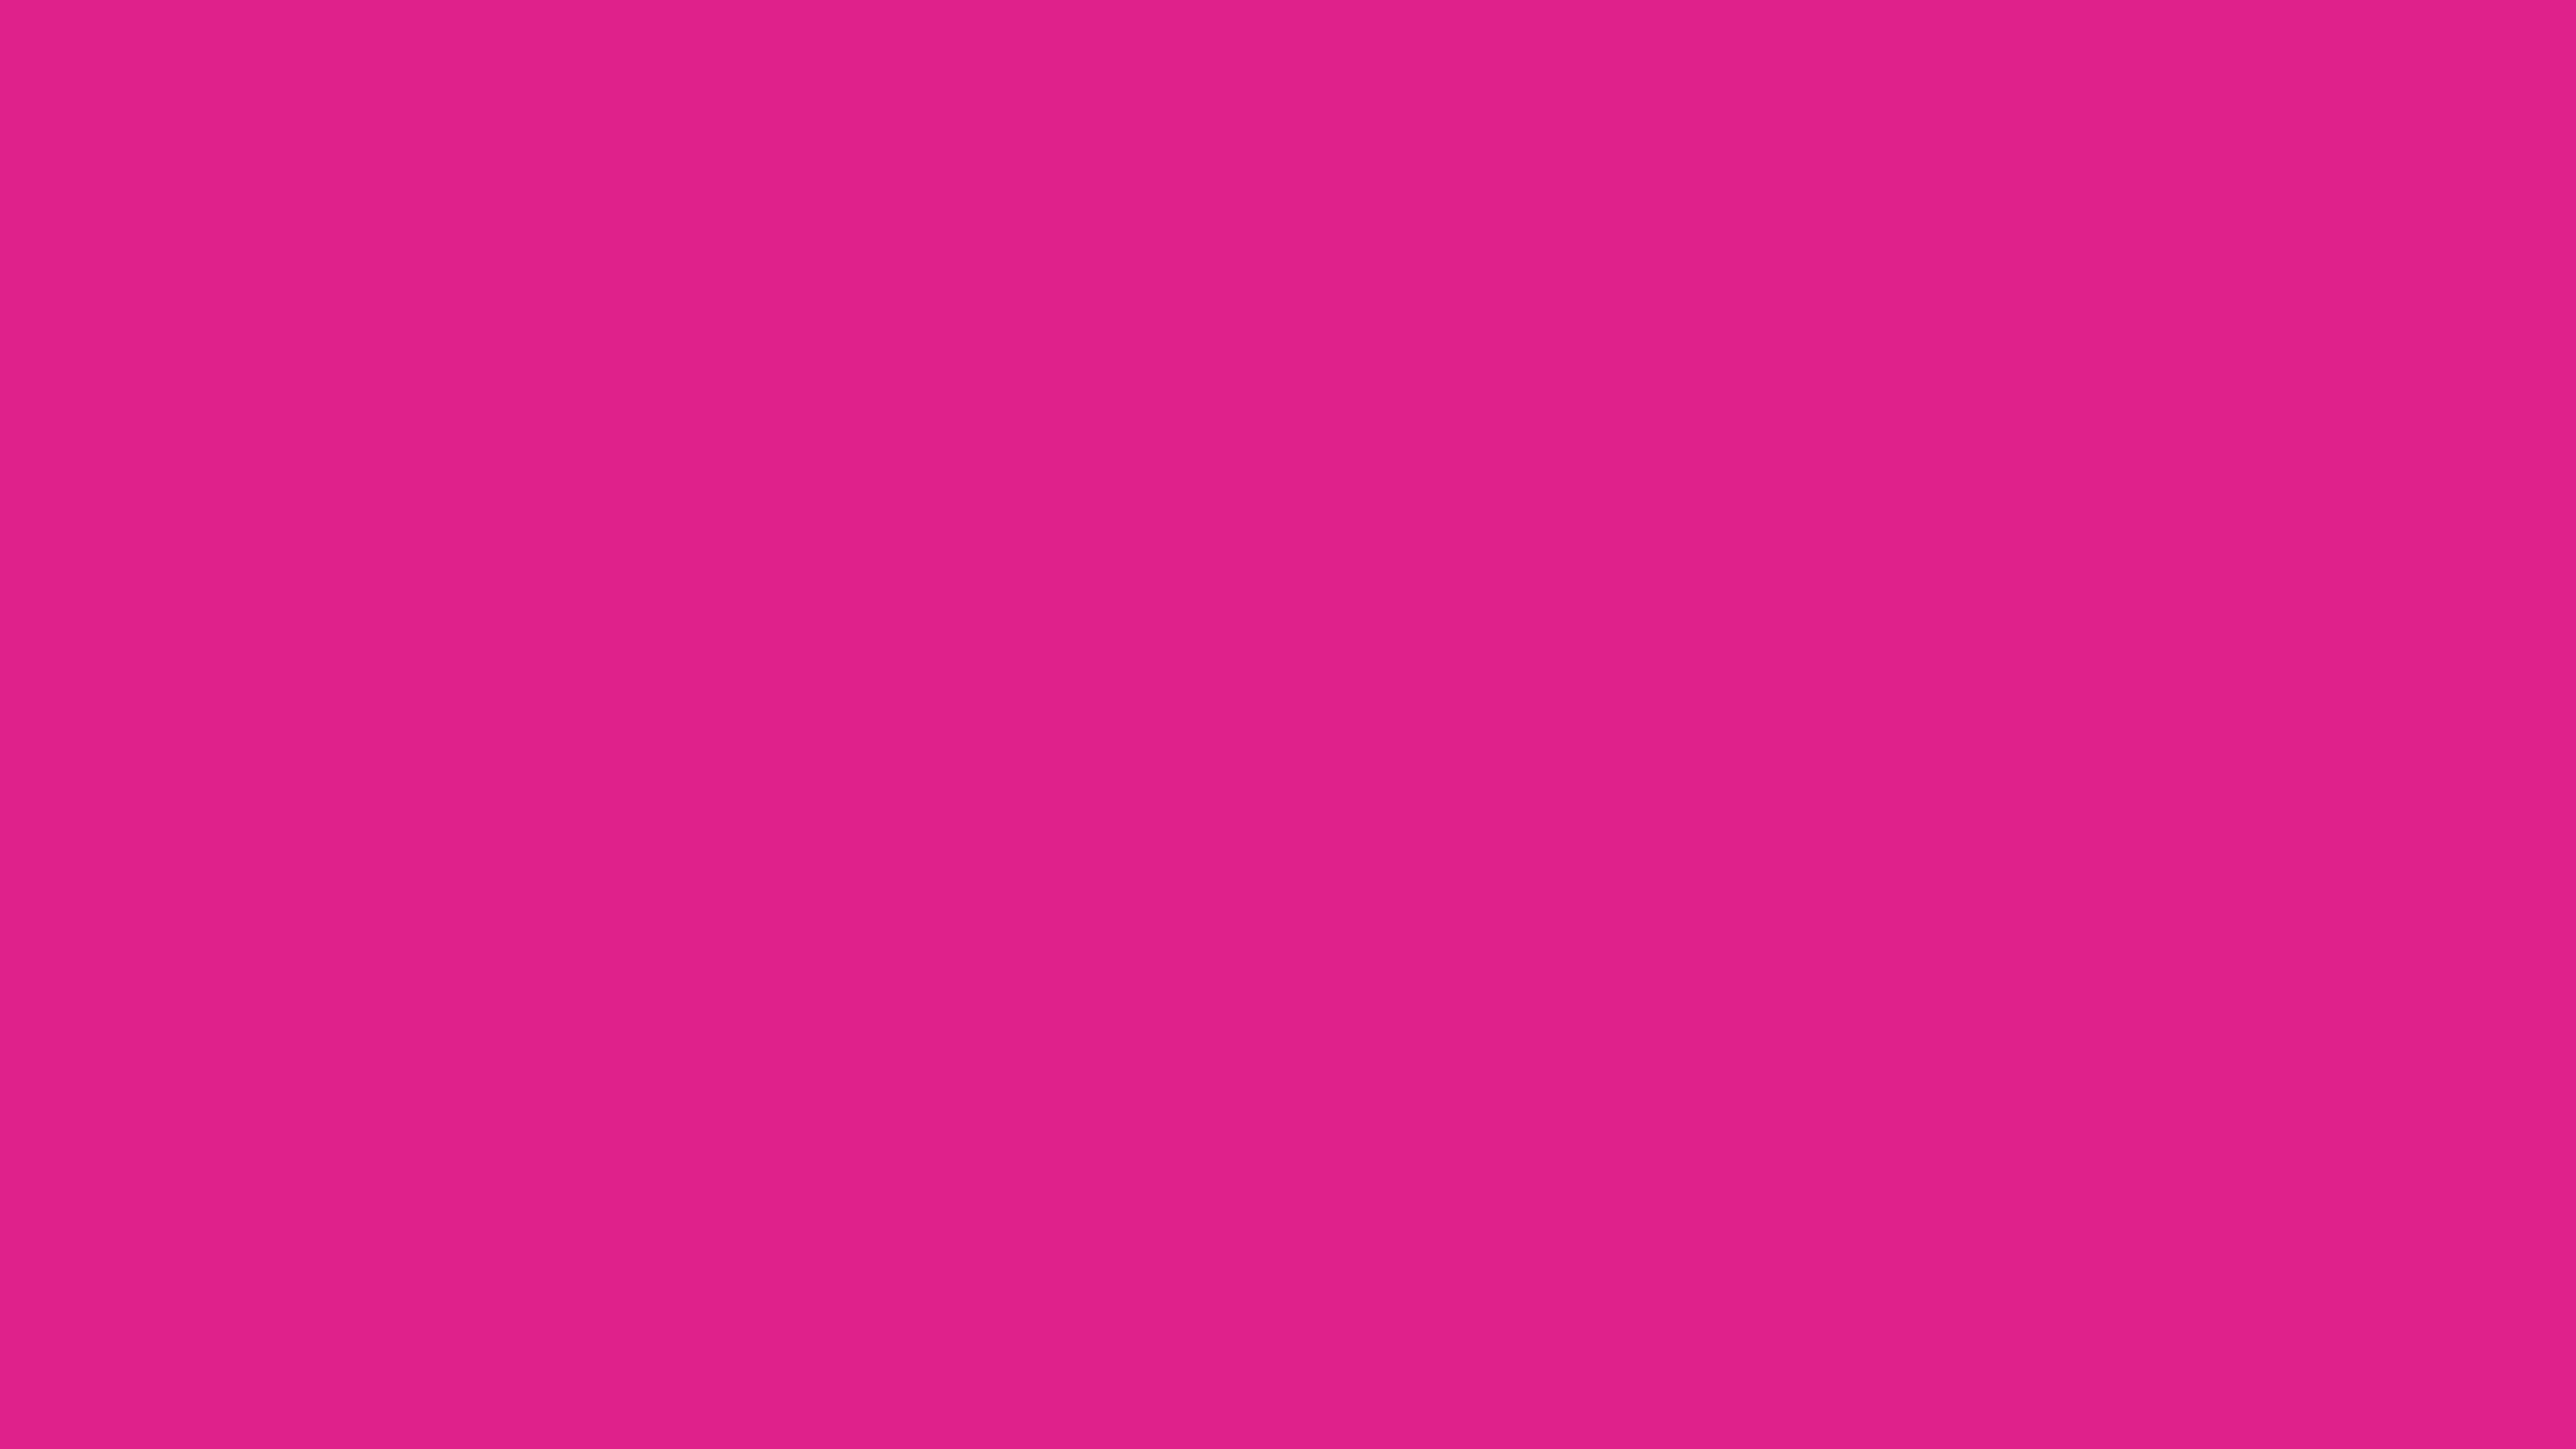 3840x2160 Barbie Pink Solid Color Background